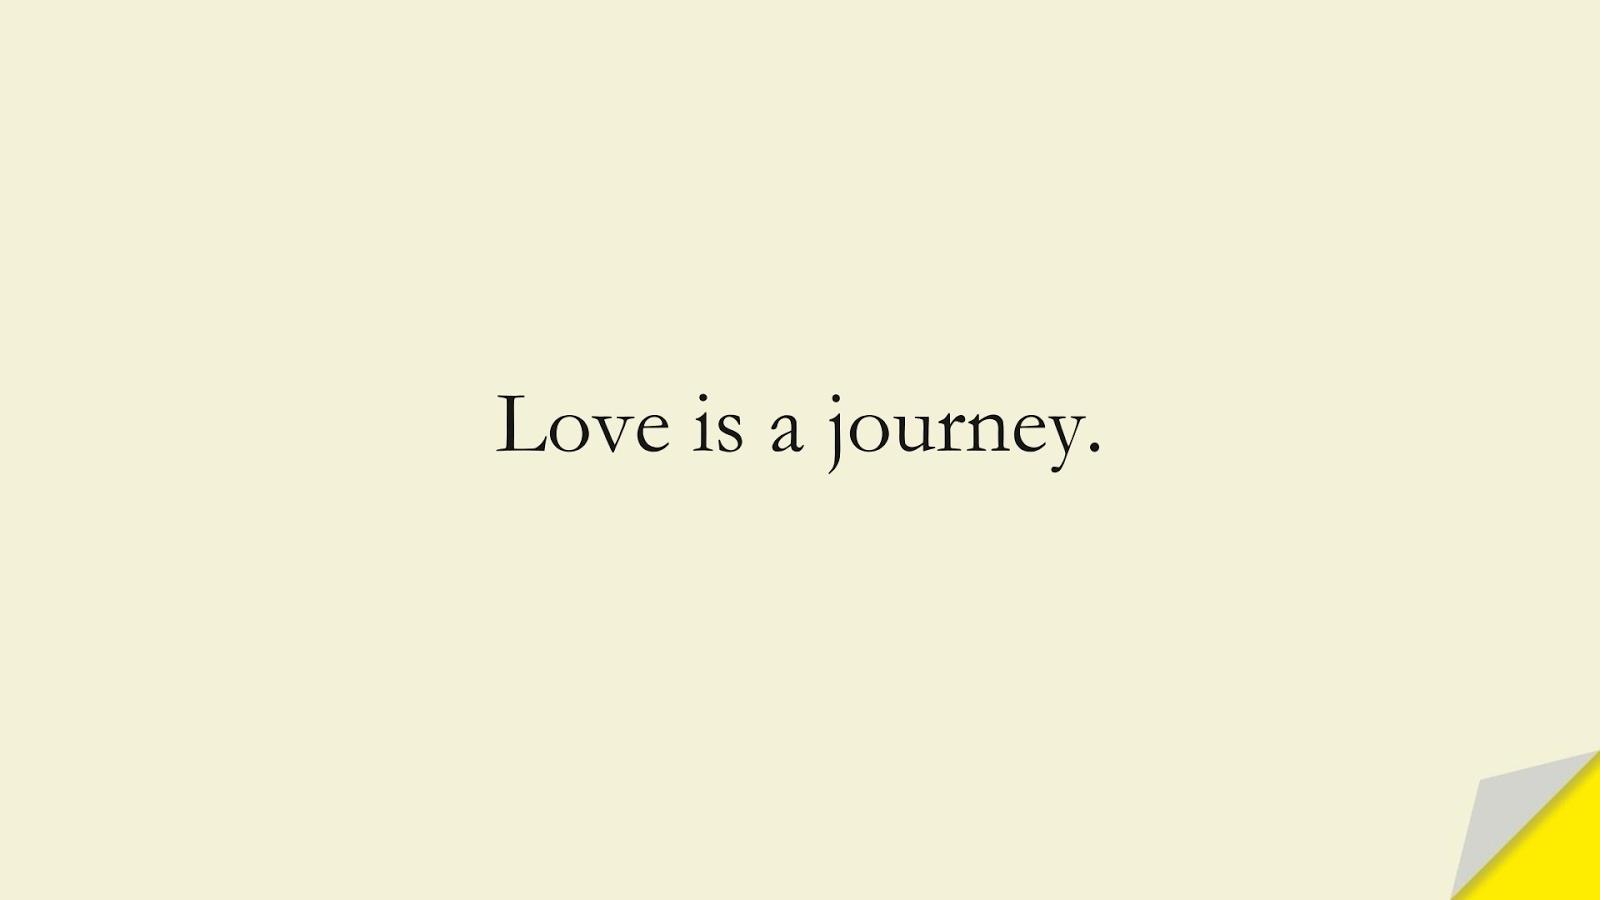 Love is a journey.FALSE